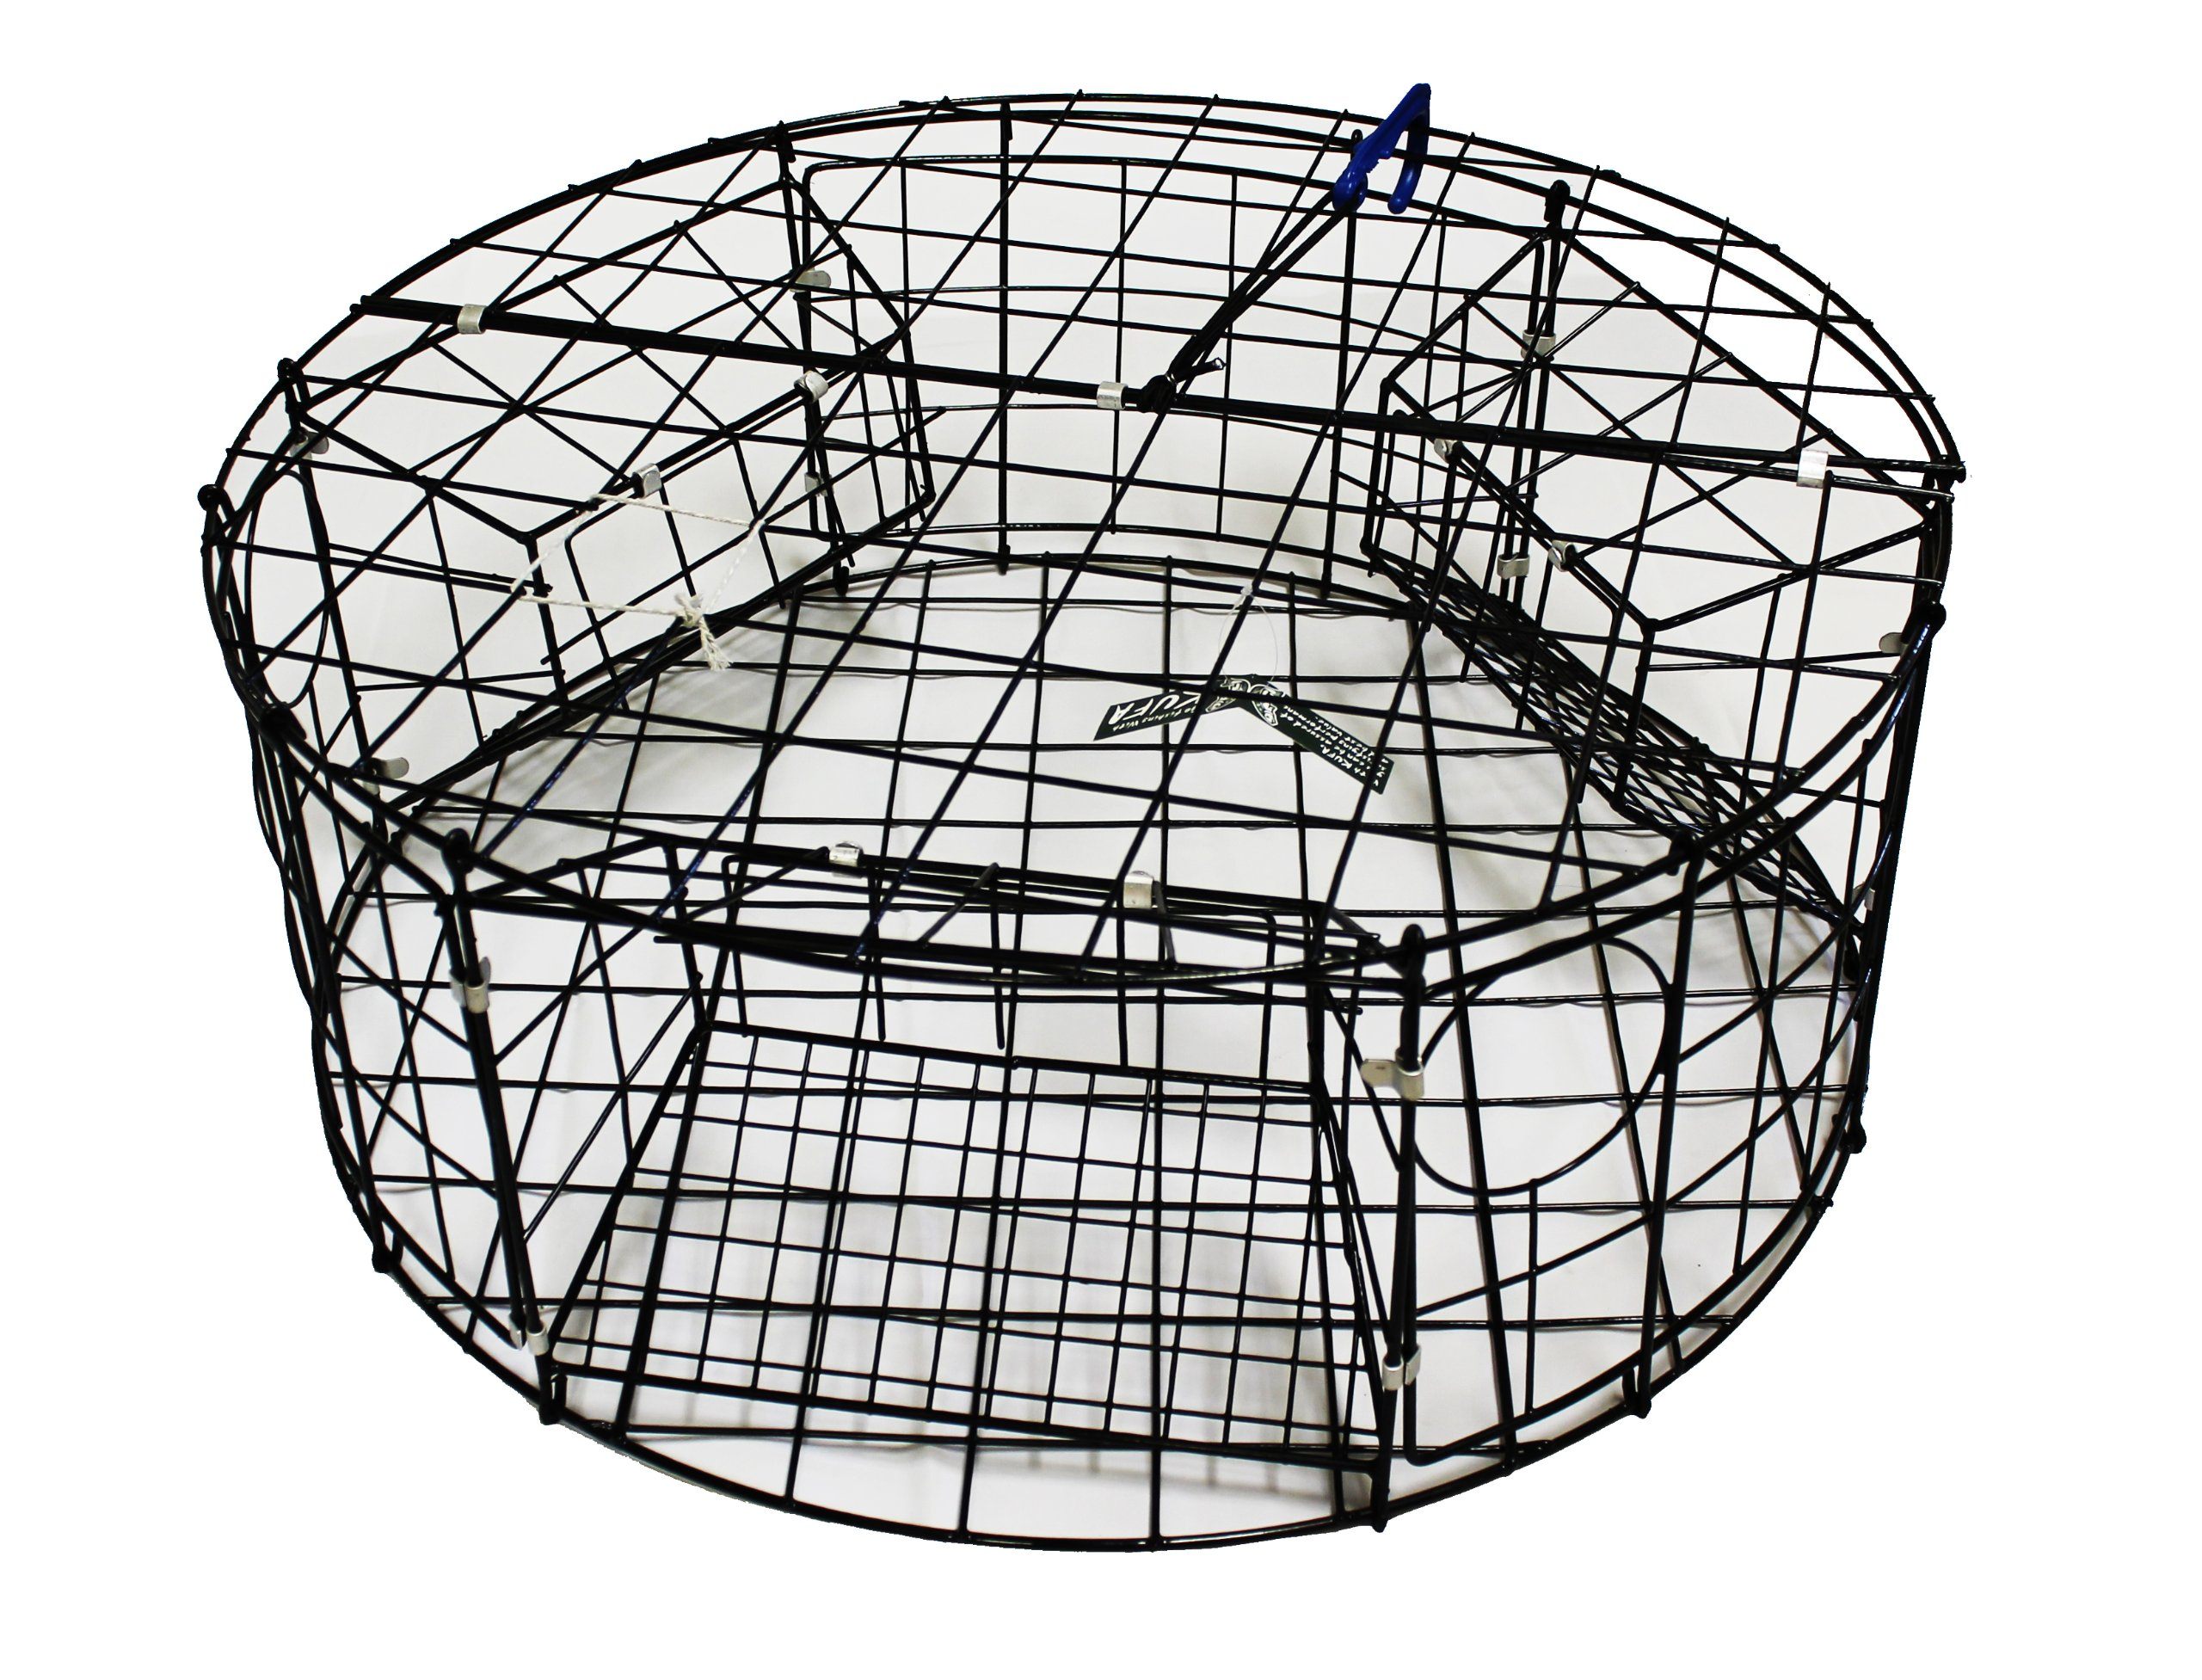 KUFA Vinyl coated Crab Trap (ø30''xx12''H) with 3 large entrance by KUFA Sports